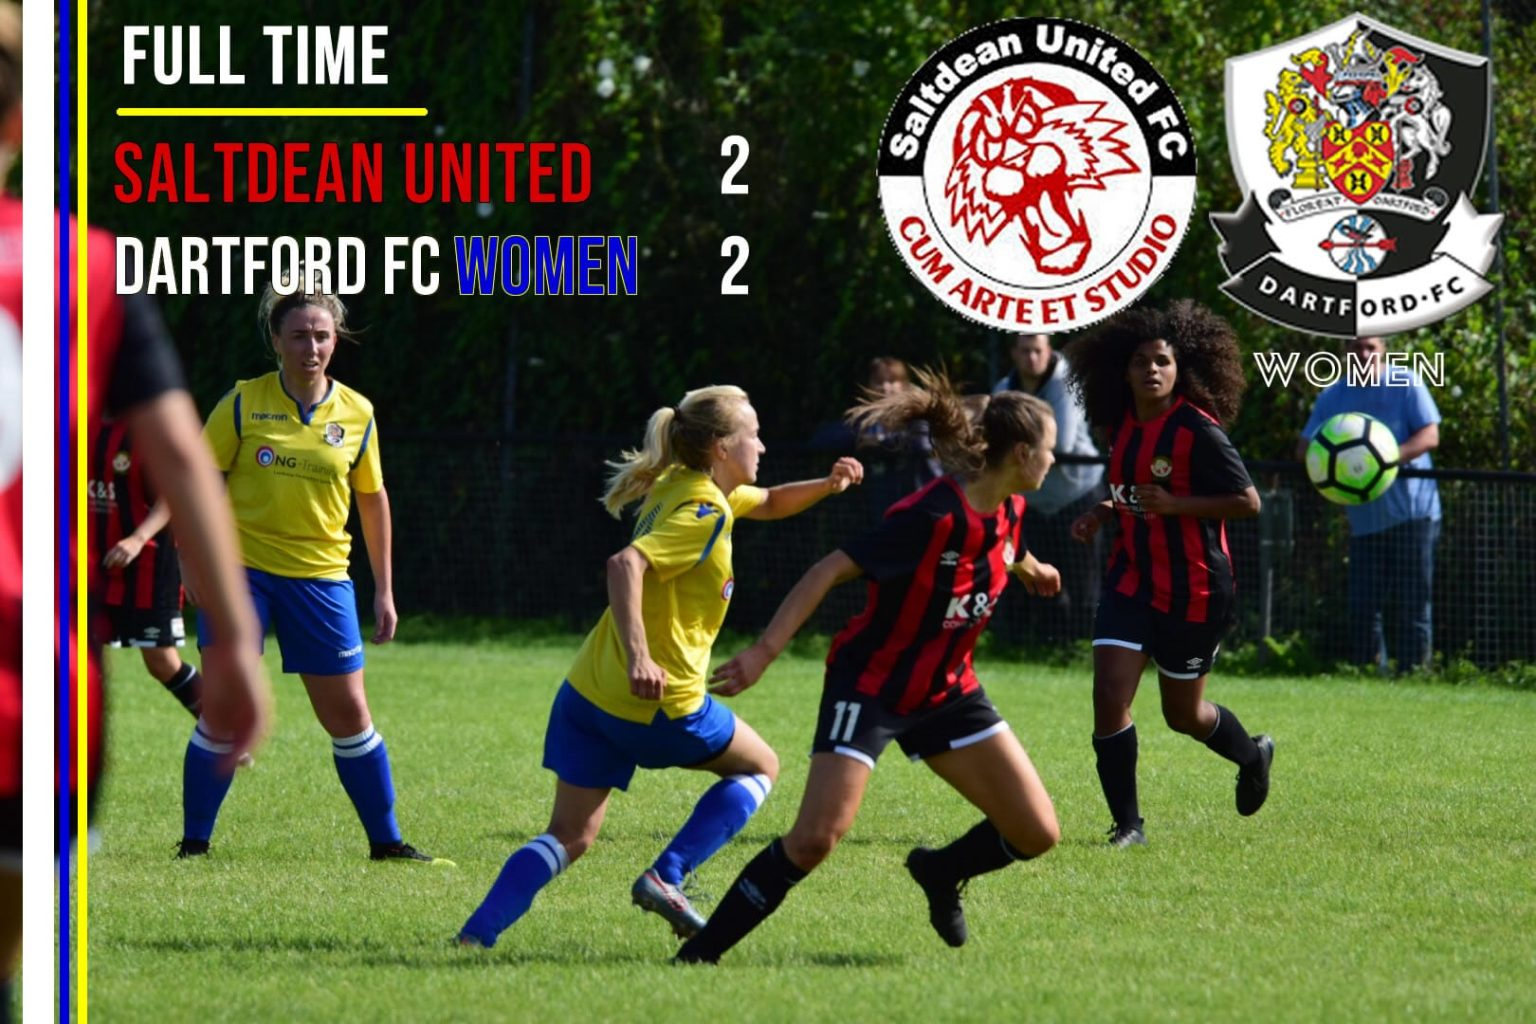 MATCH REPORT – Saltdean United 2 v 2 Dartford FC Women